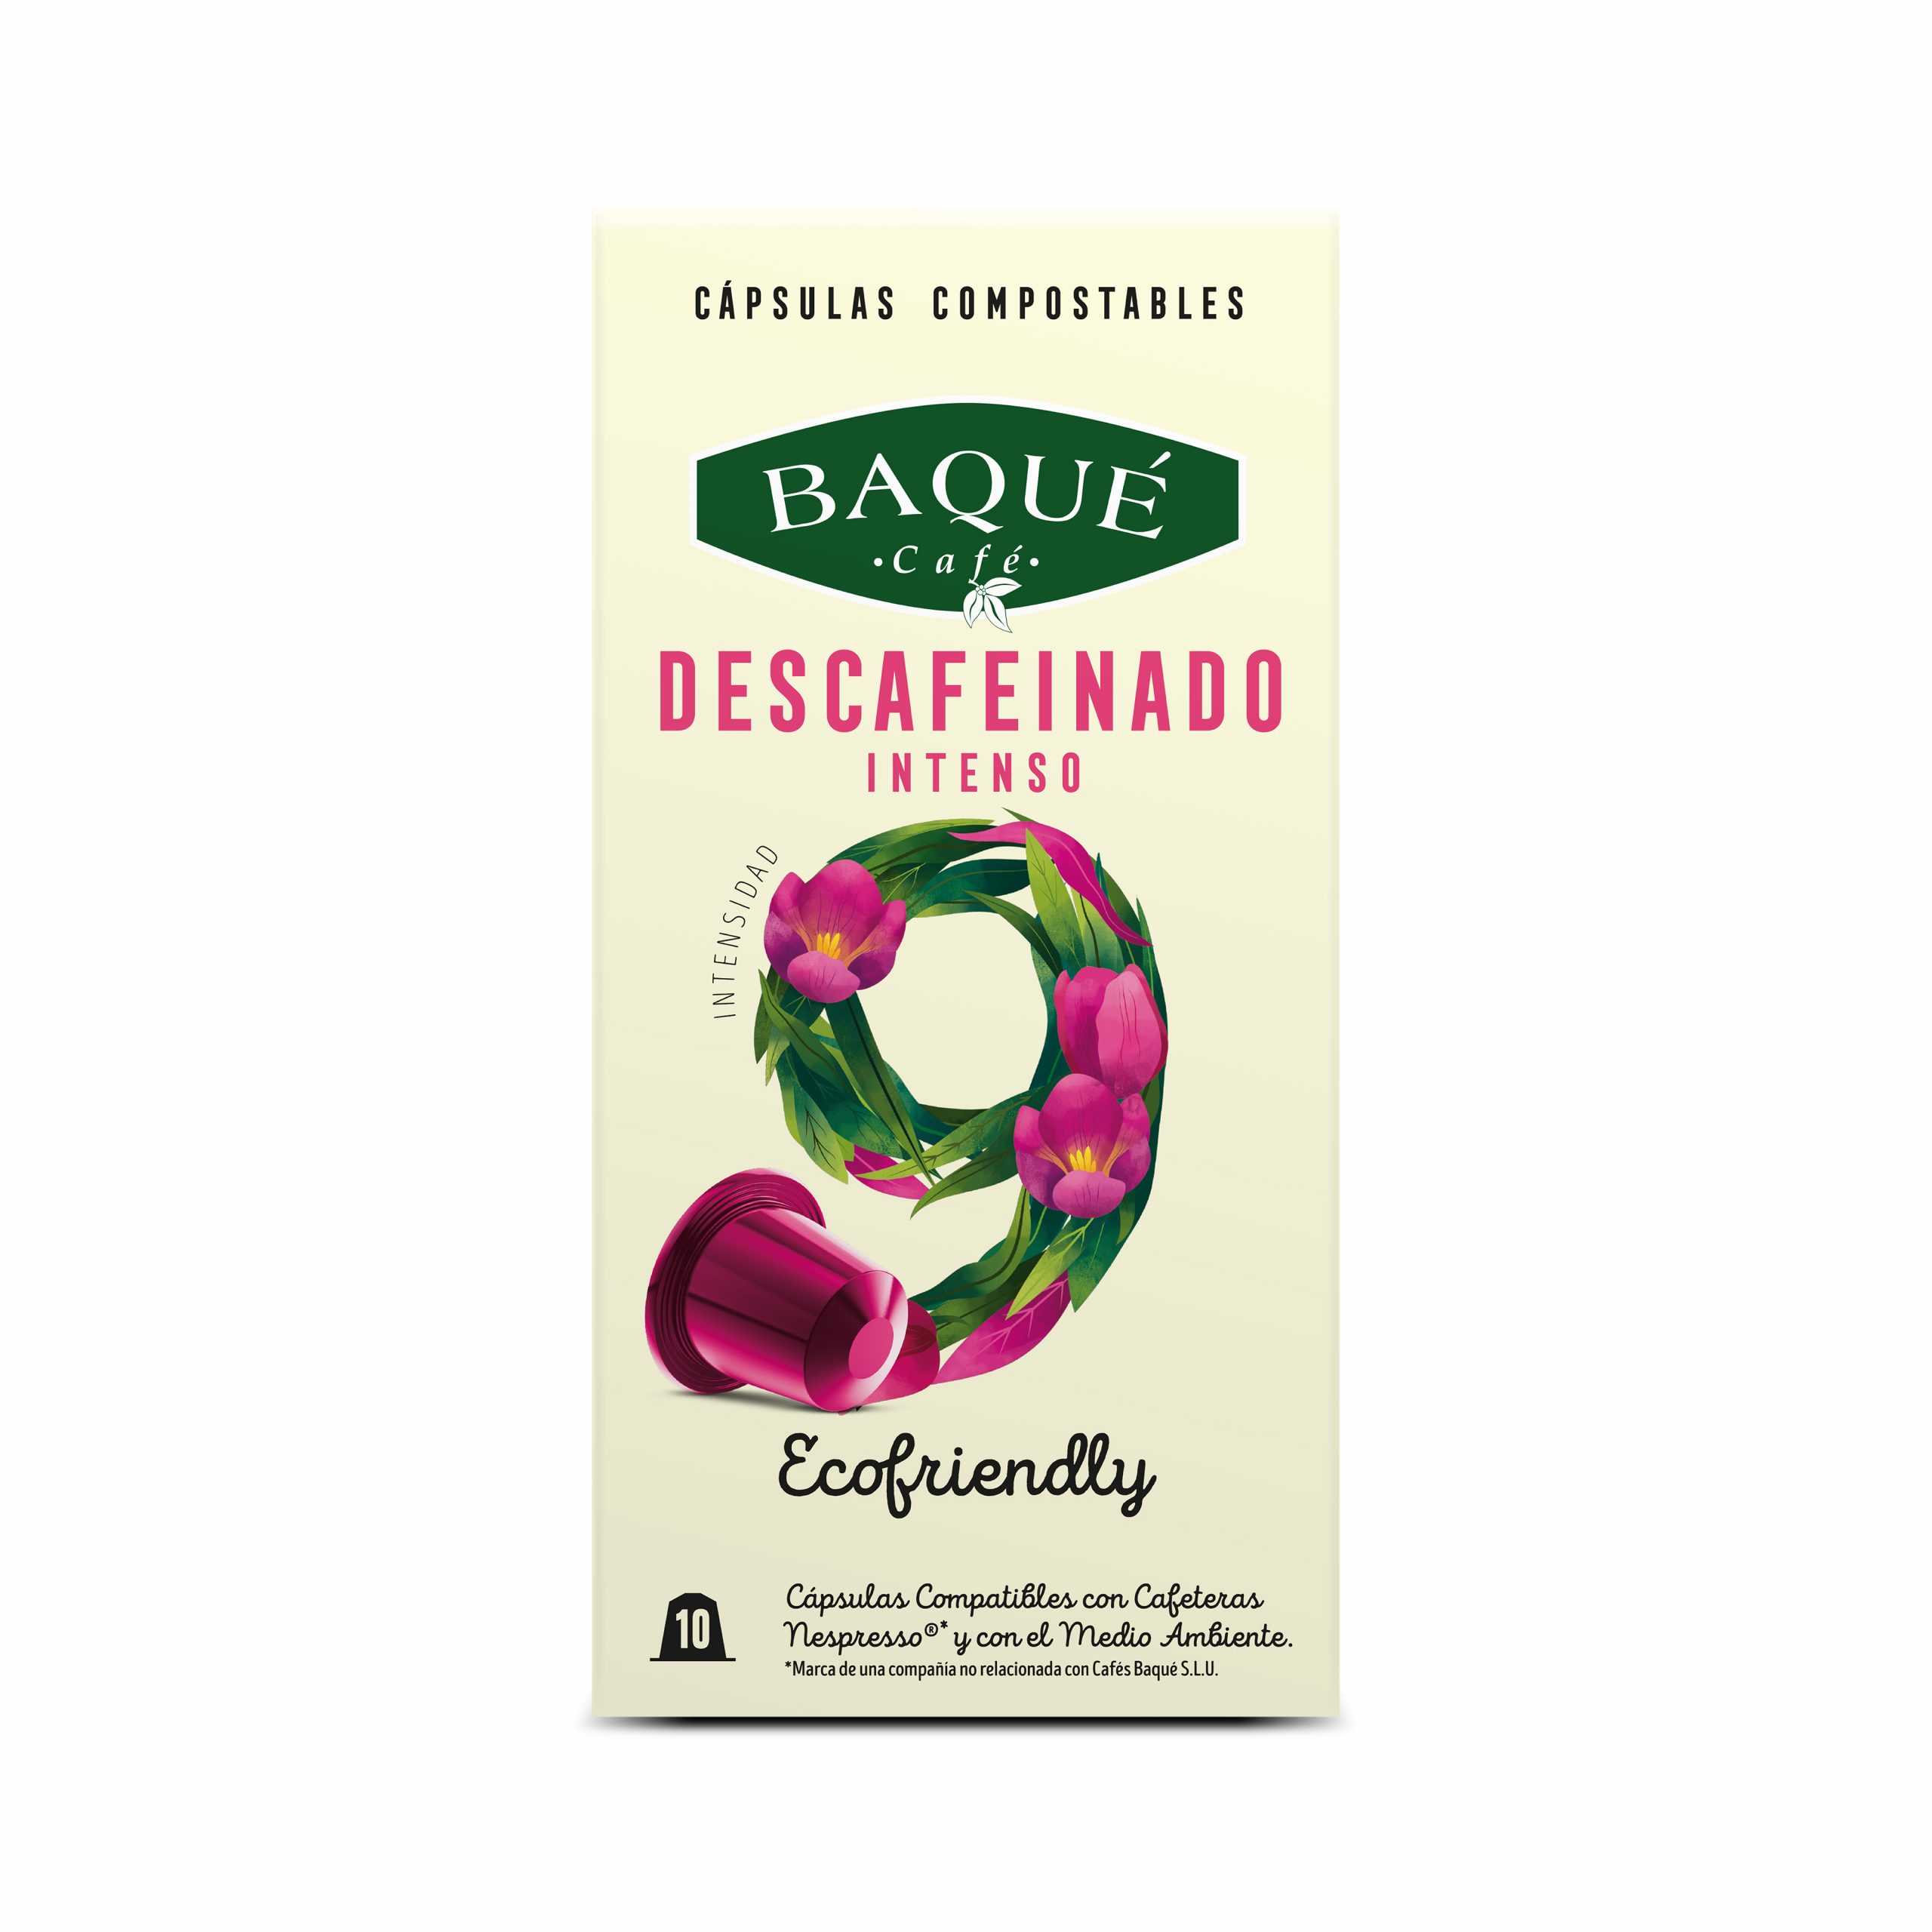 Descafeinado Intenso 10 cápsulas Compostables compatibles Nespresso®